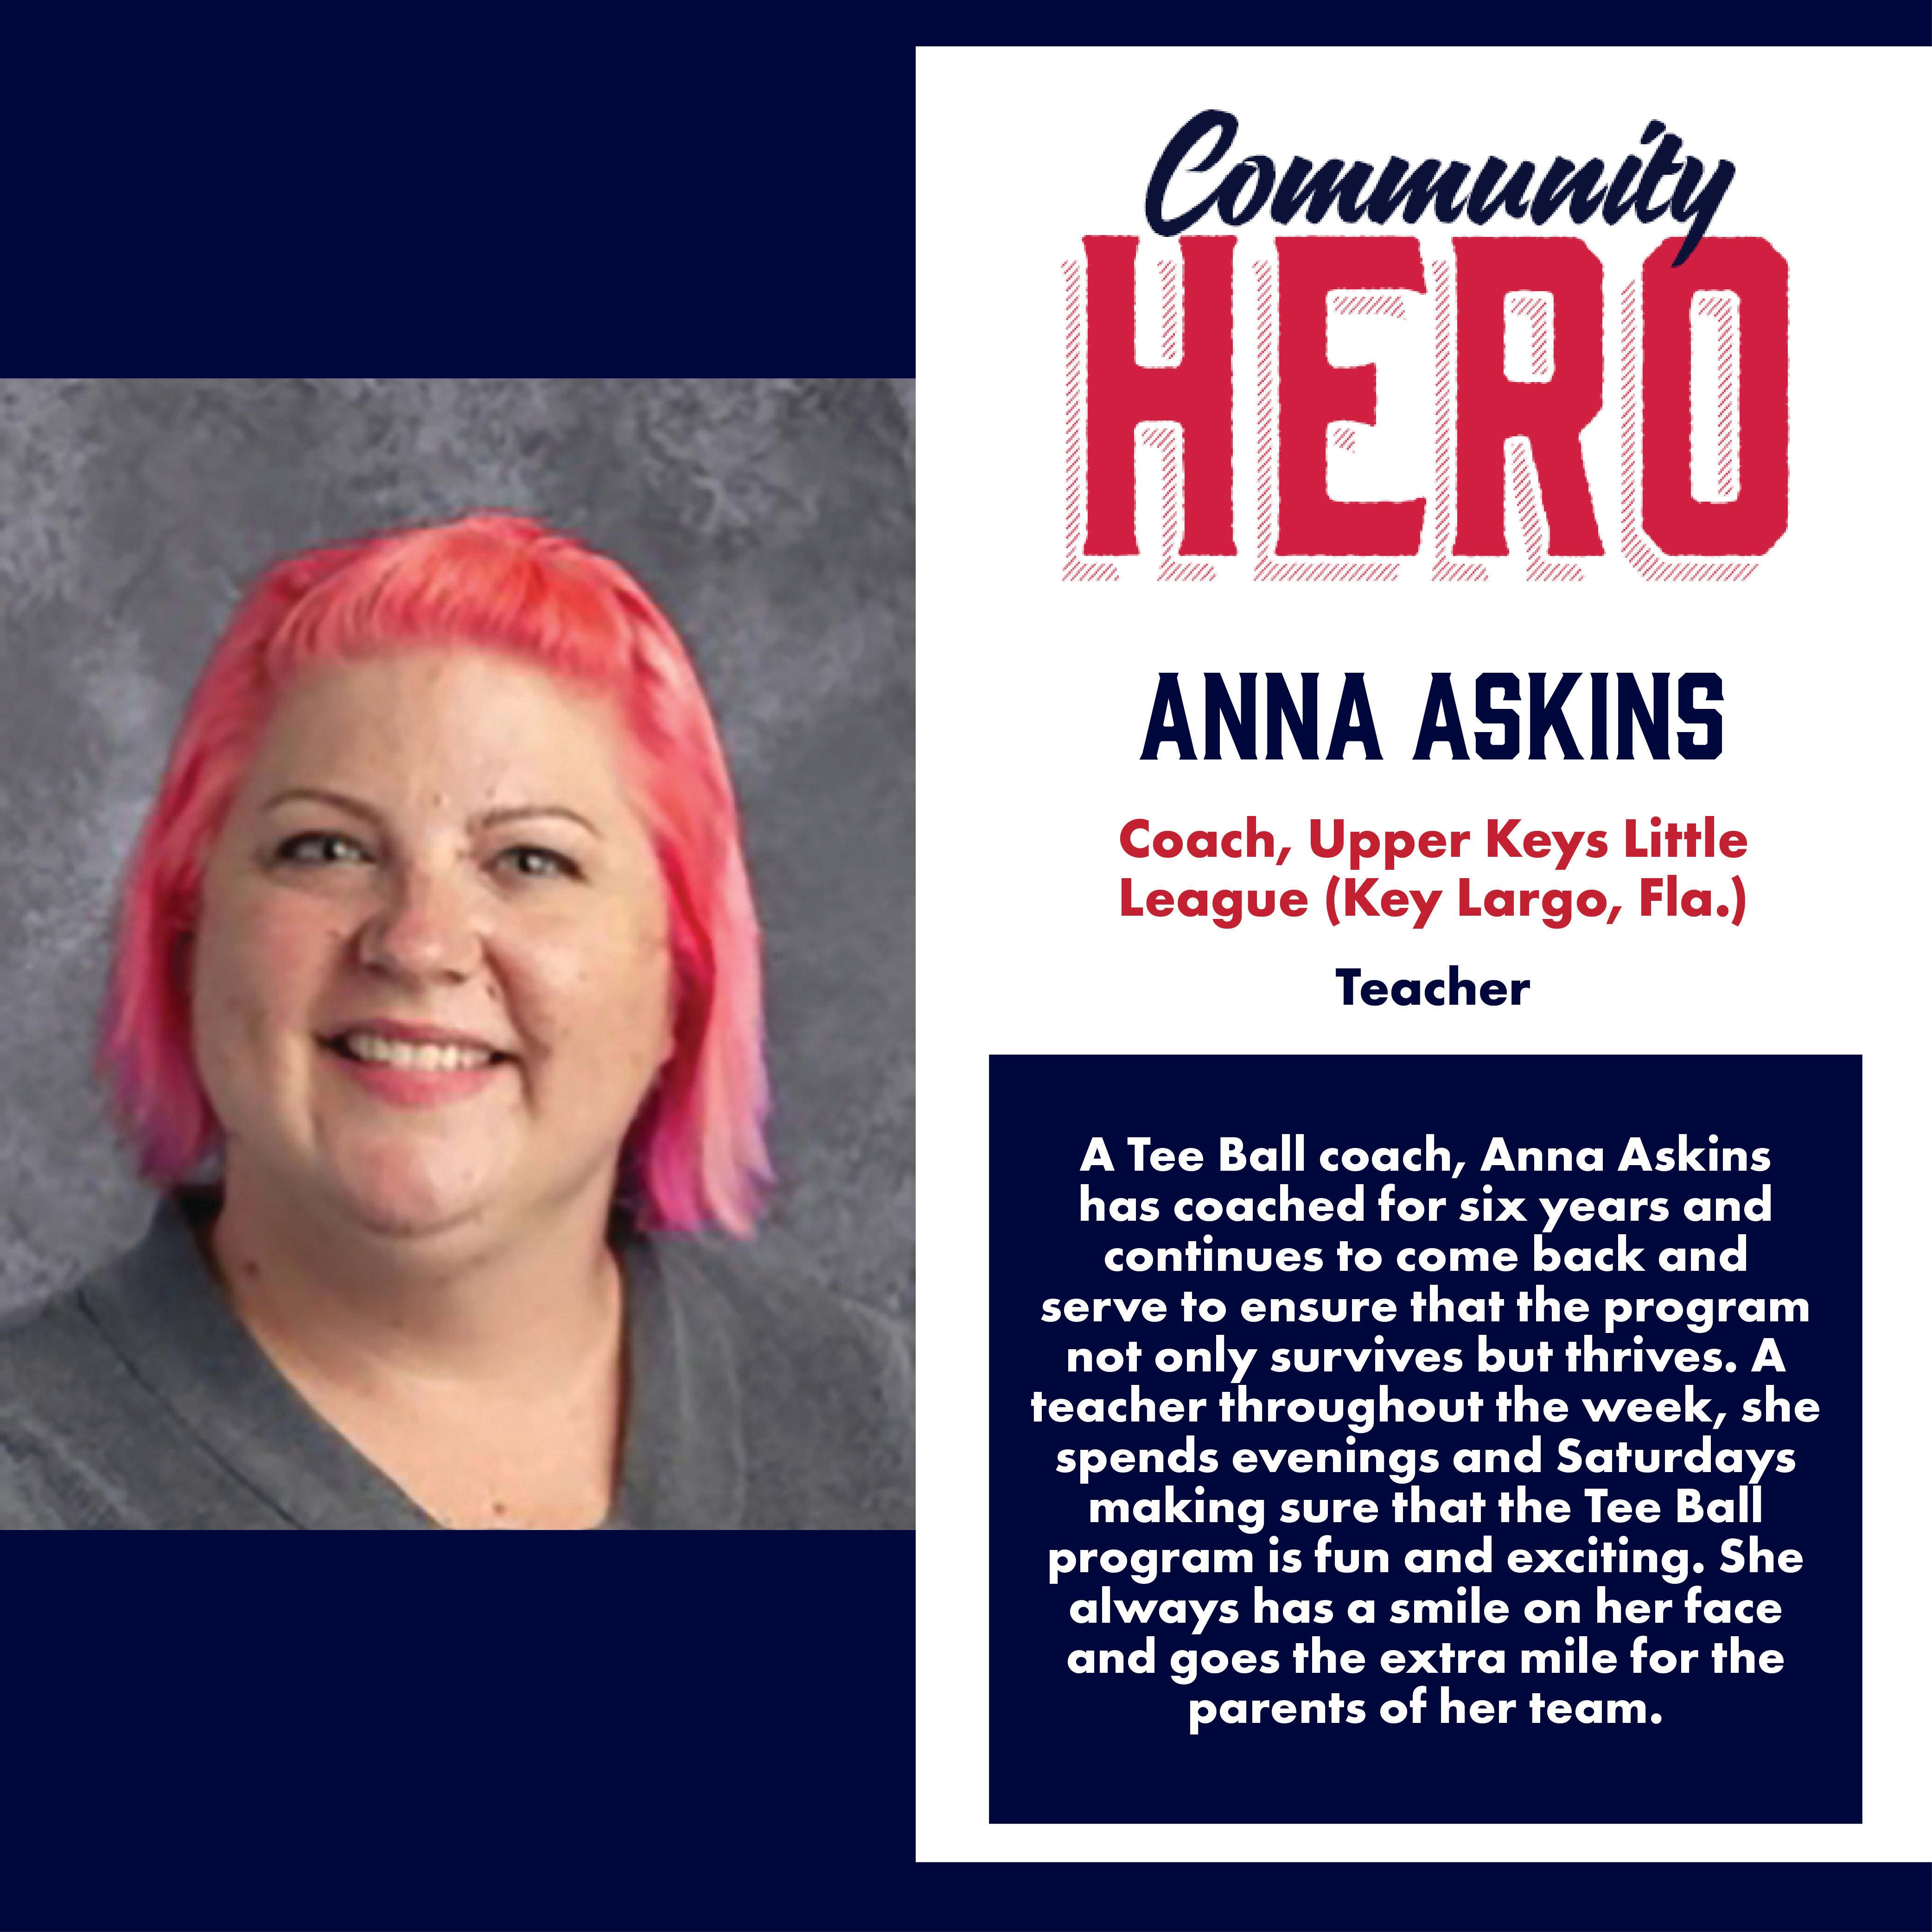 Anna Askins Community Hero